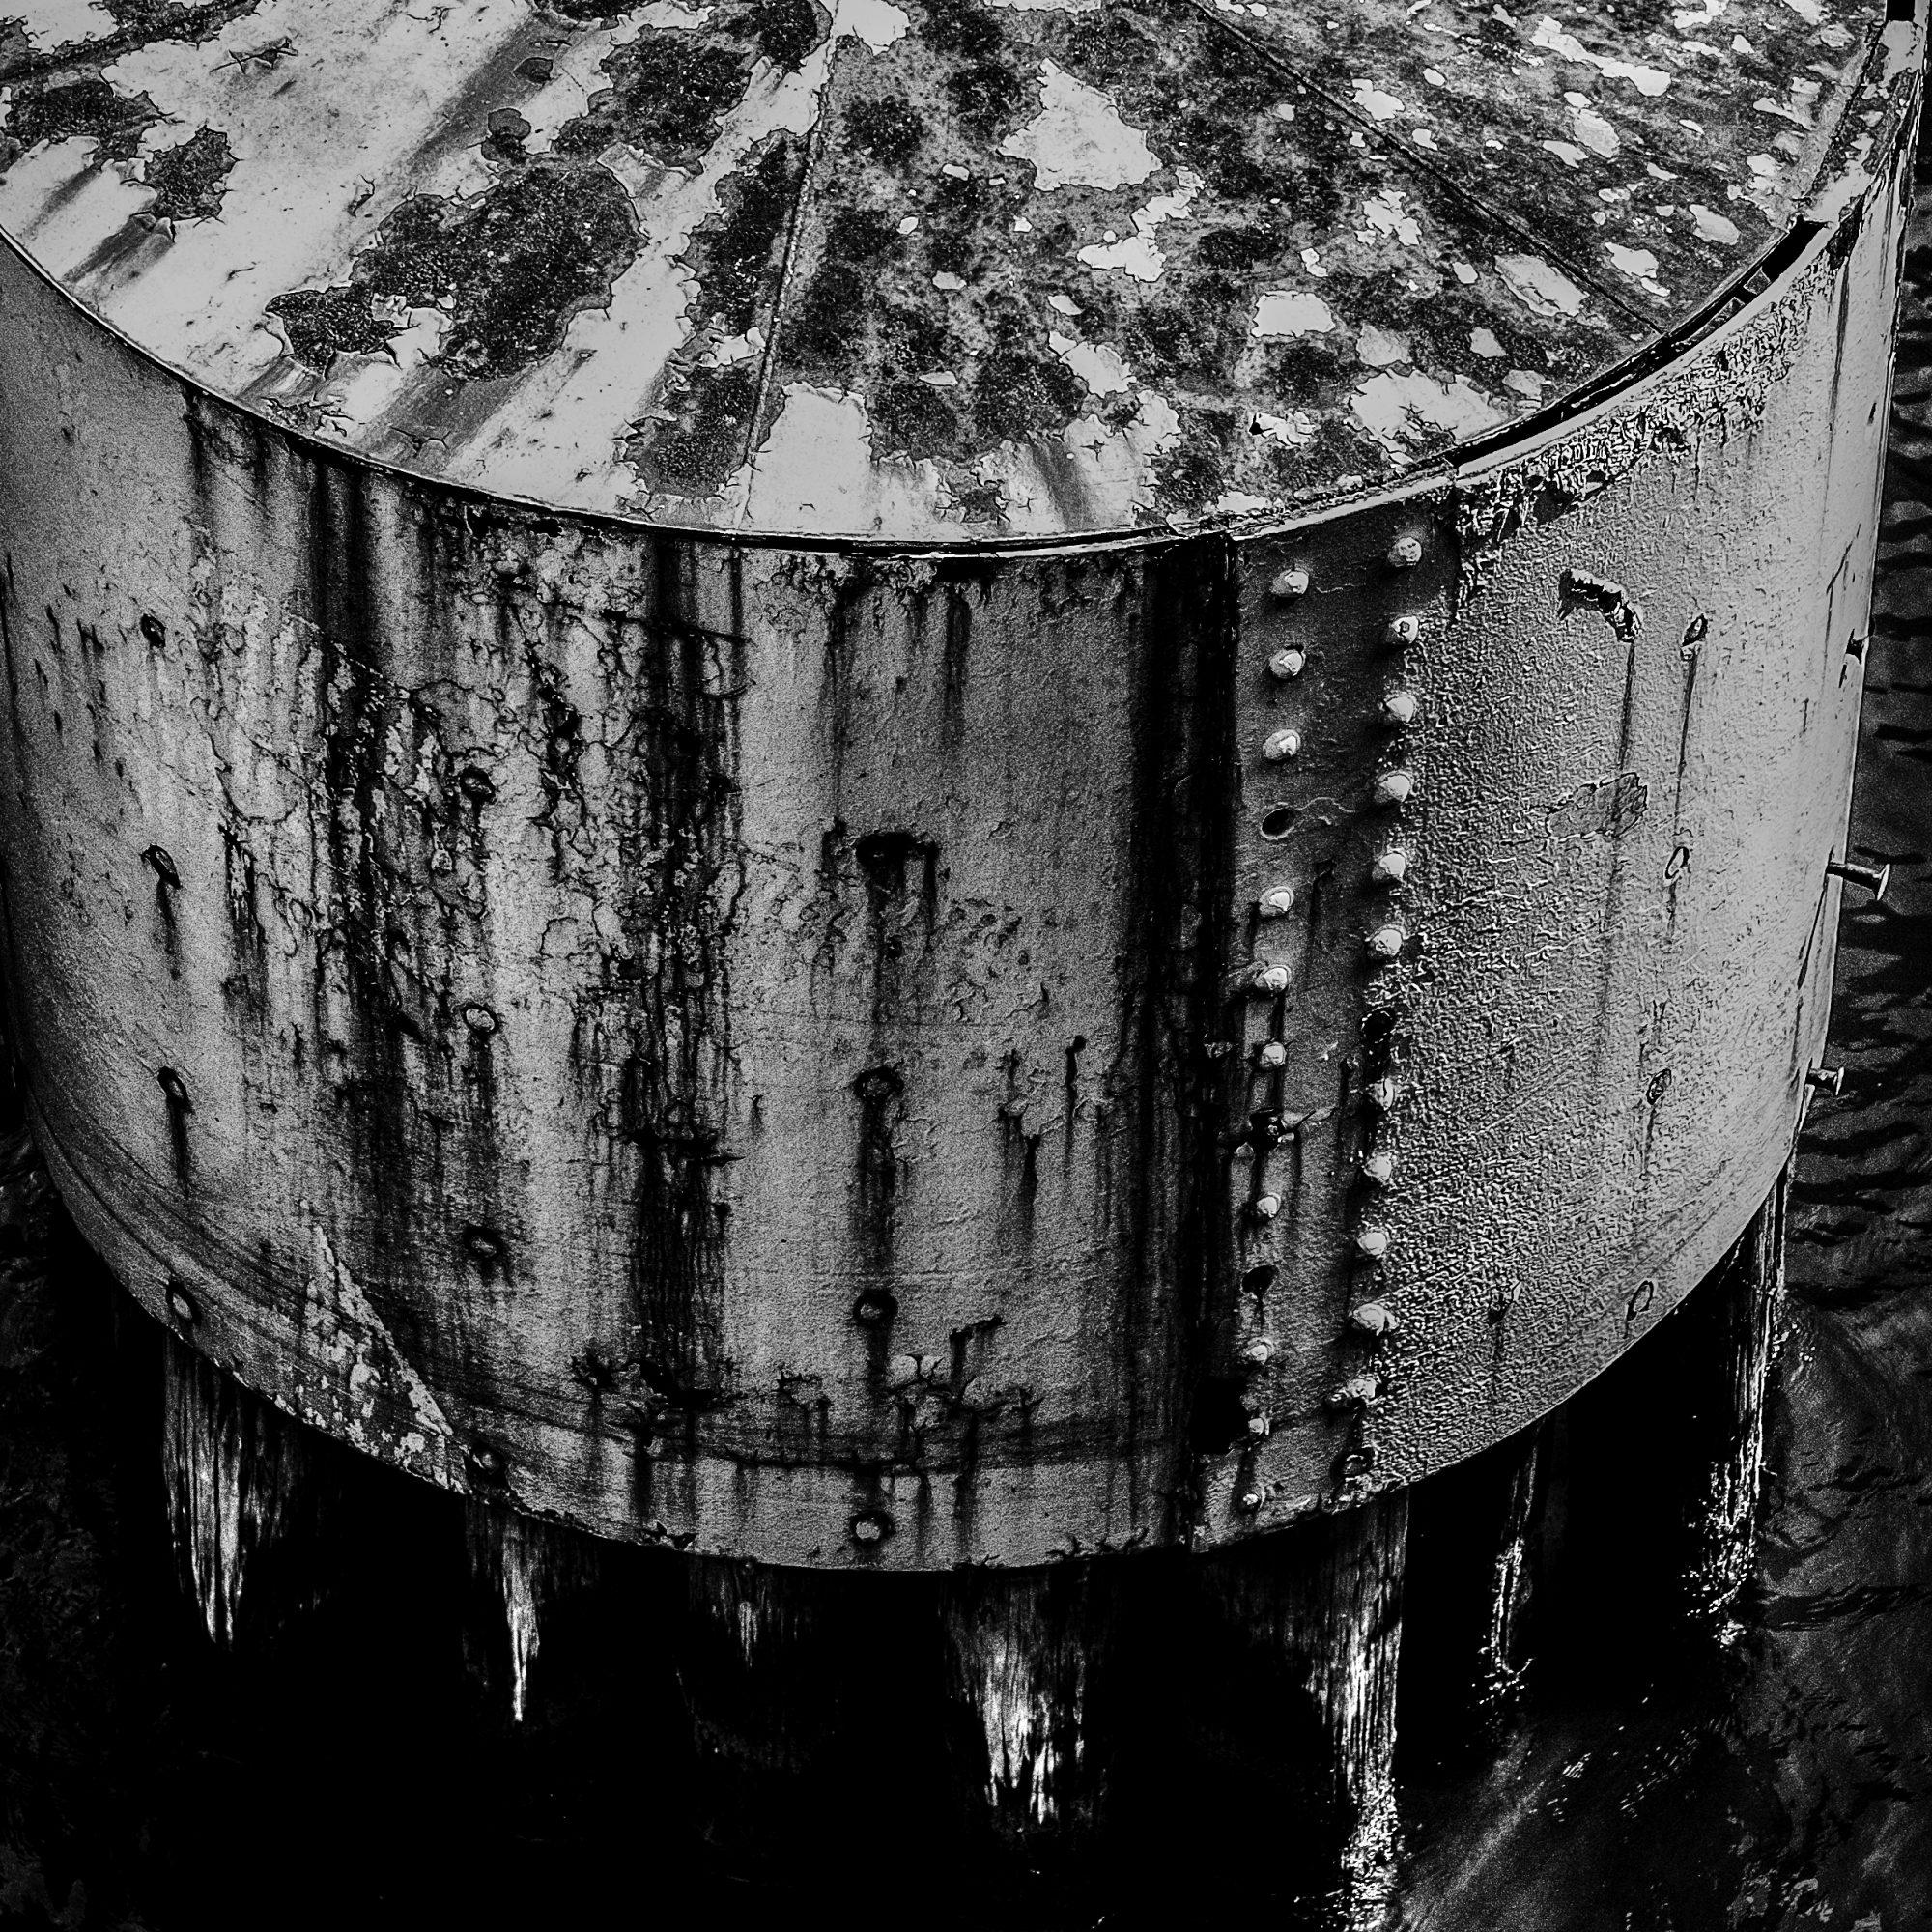 """Minimalist Urban Vignettes"" by Kent Larsson"